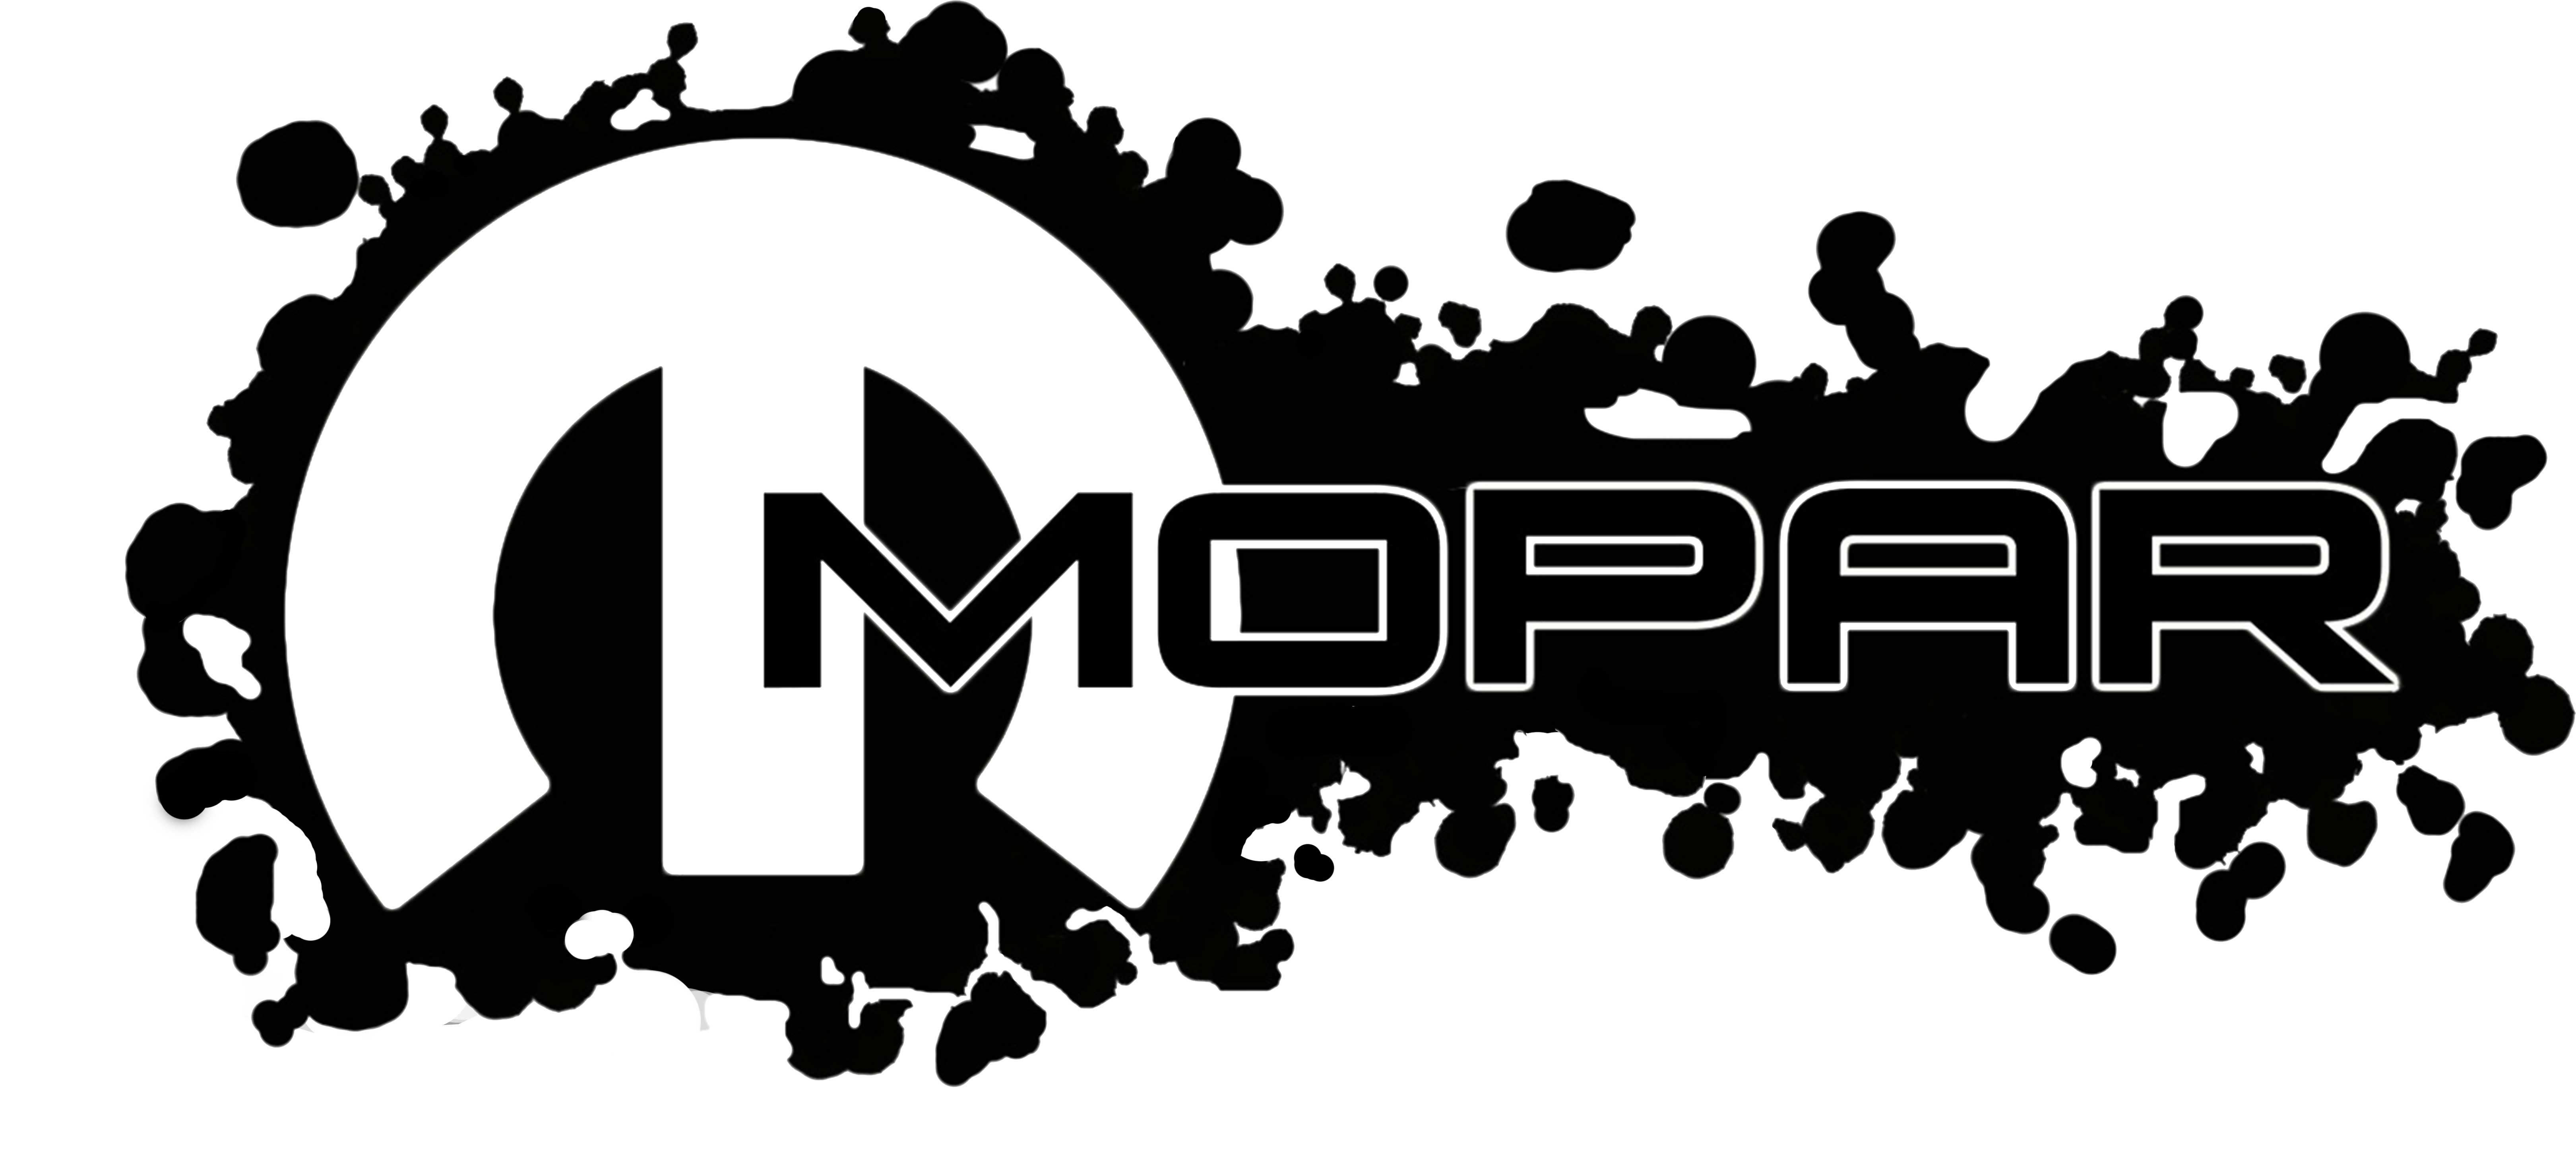 Mopar Logo Mopar Logos Pinterest Mopar, Dodge and Cars